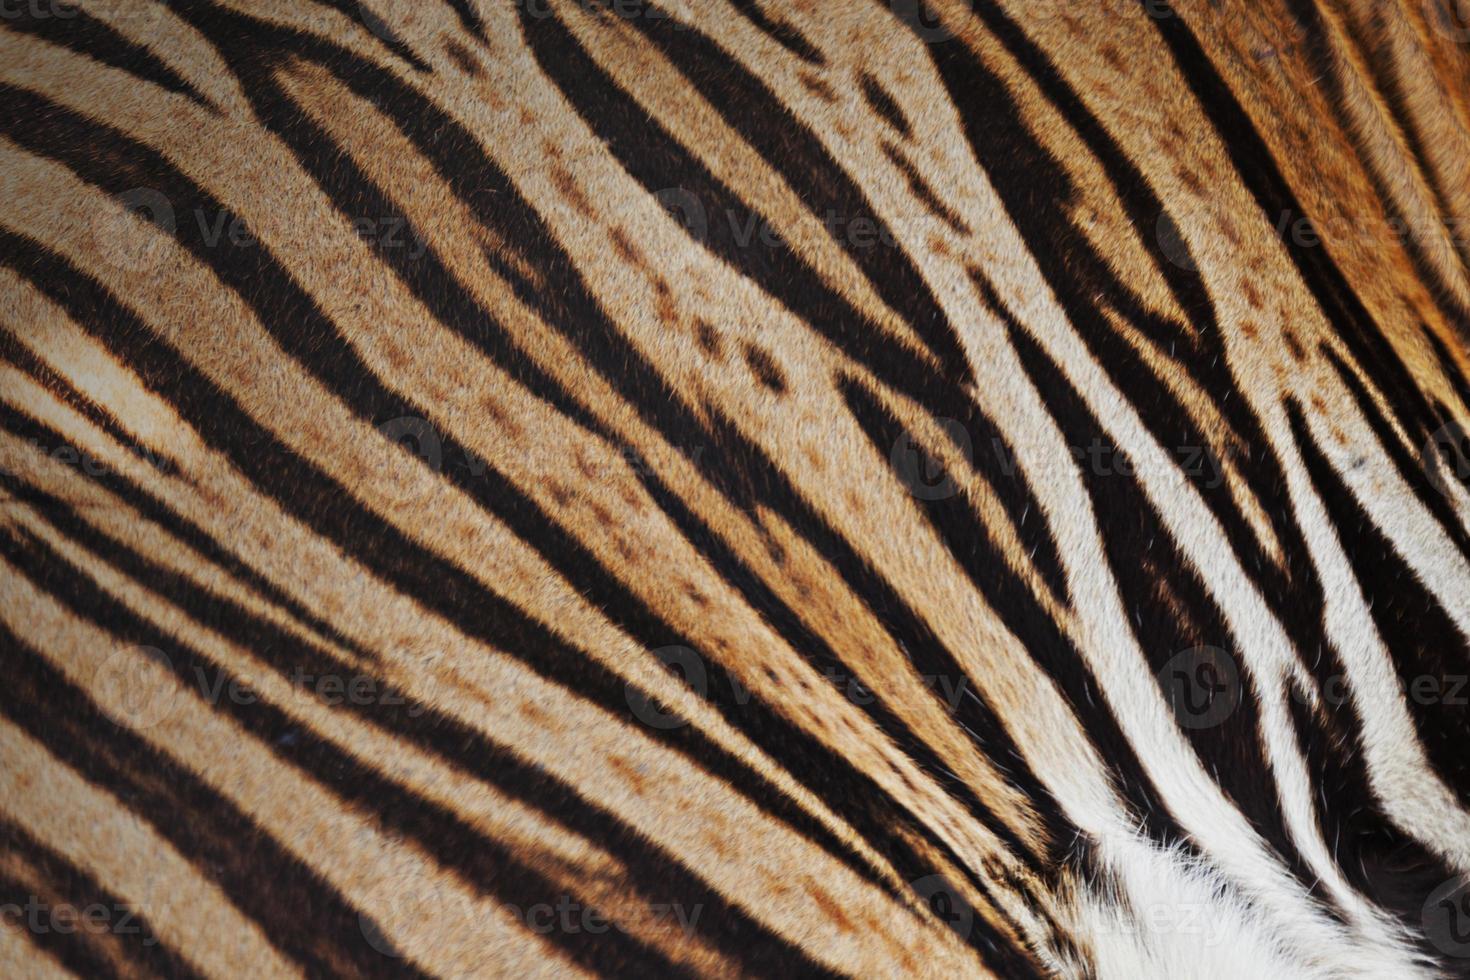 Tiger skin background photo